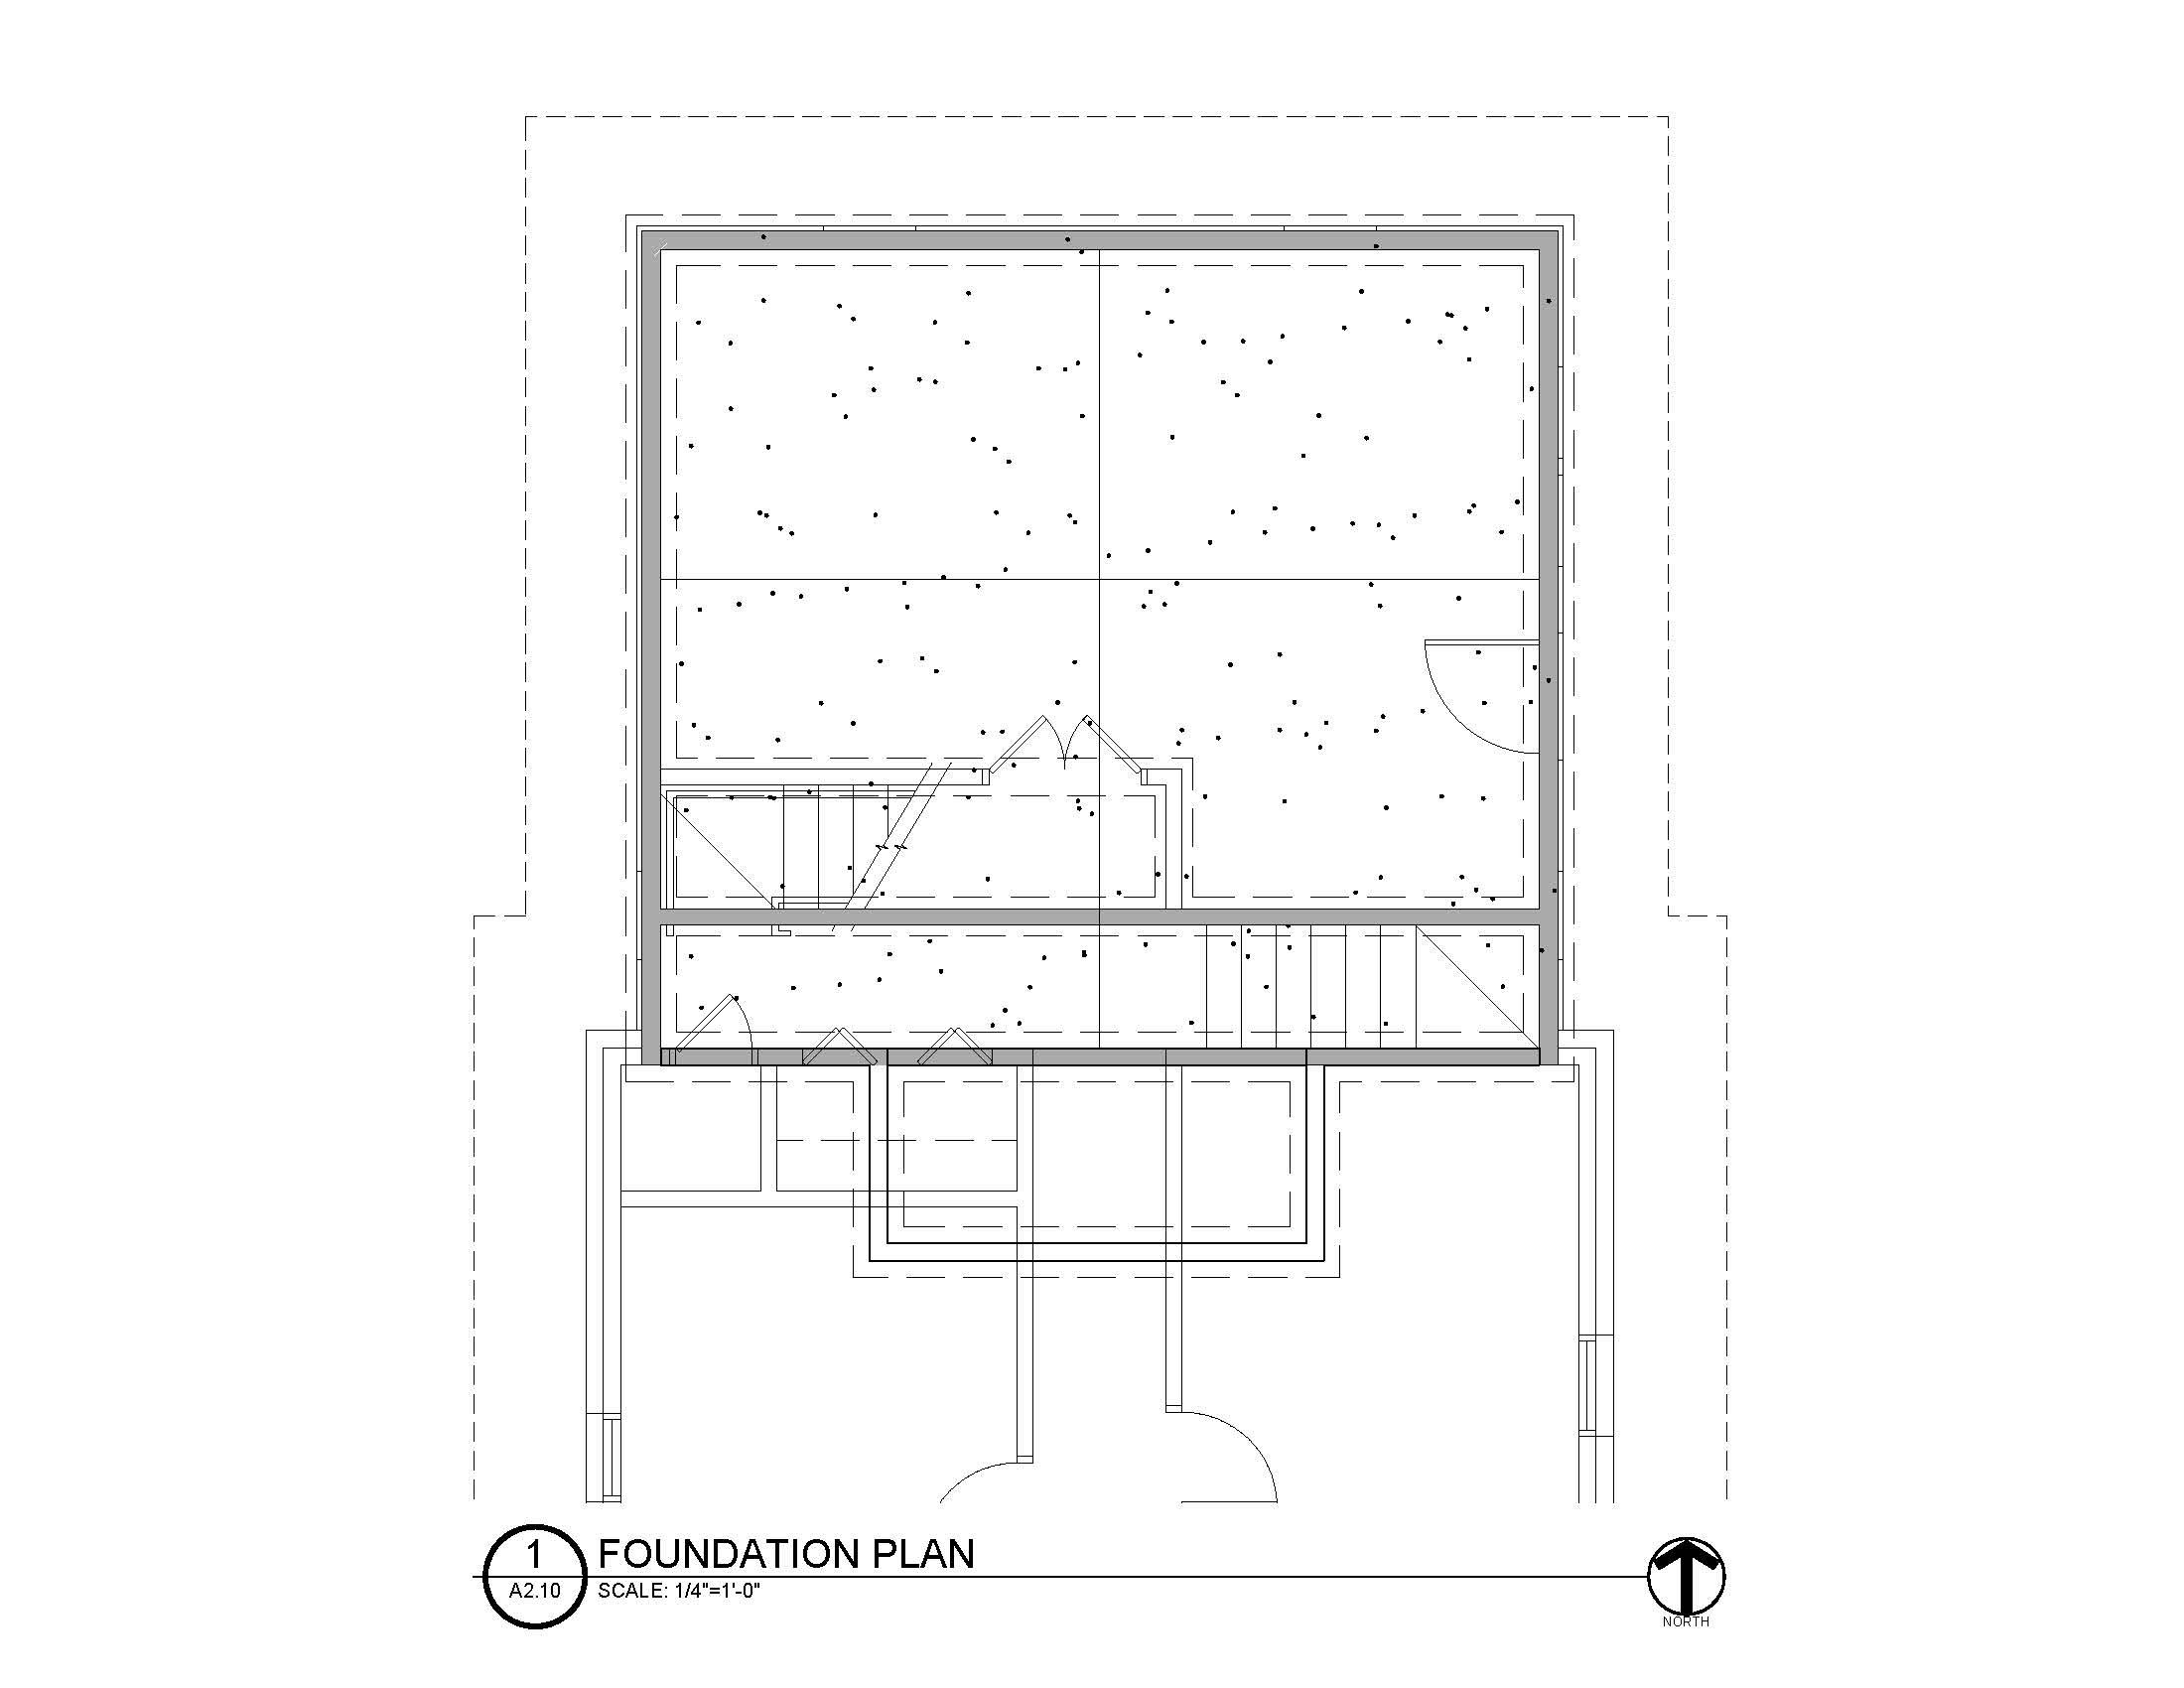 Foundation Plan (sans dimensions/notations)